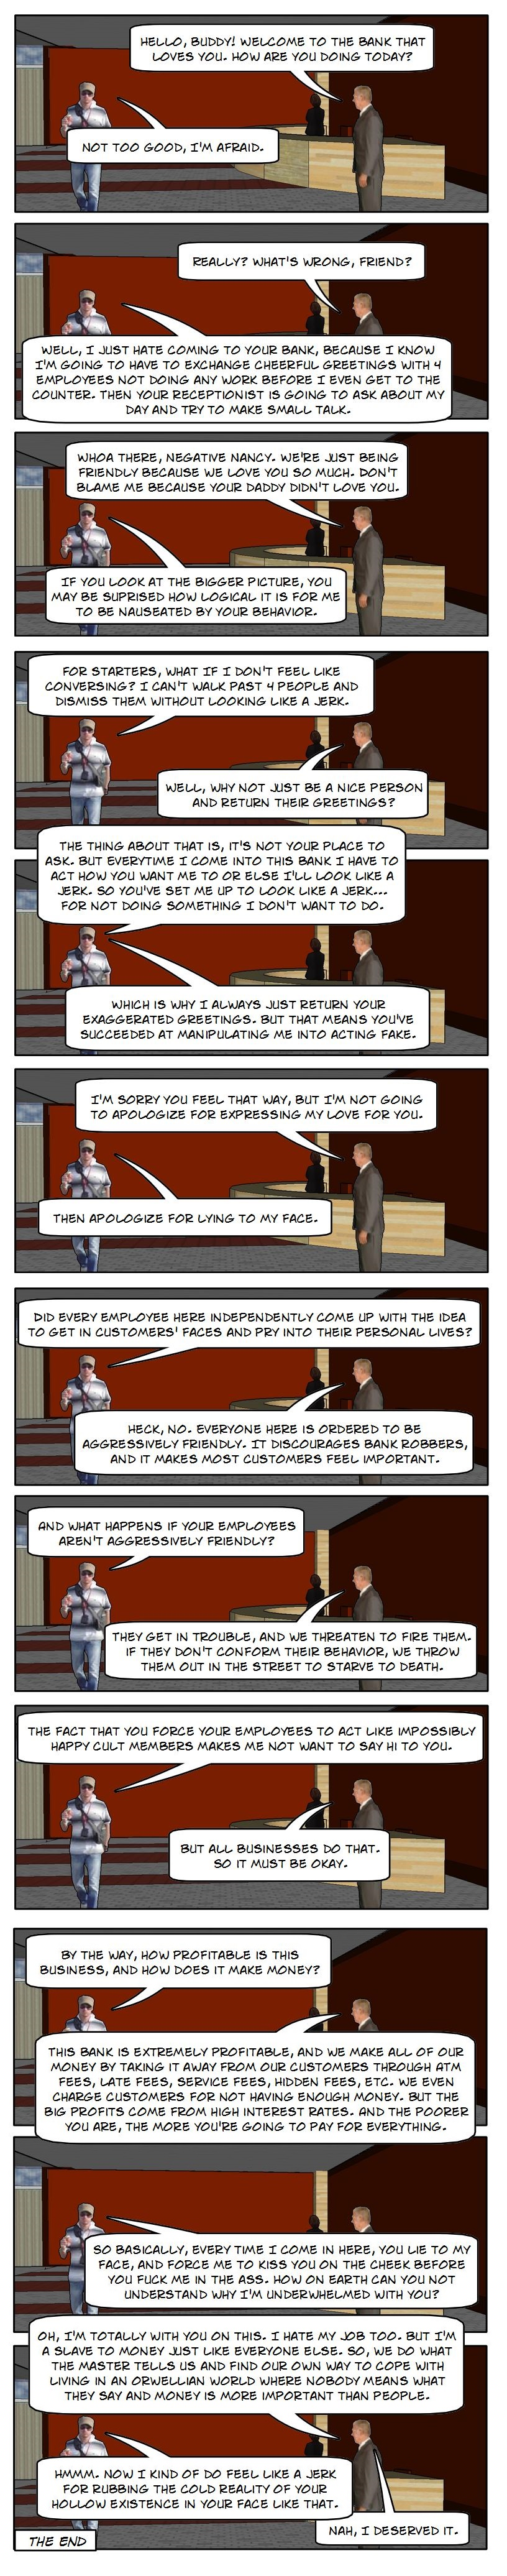 (Comic) How Bank Greeters Work